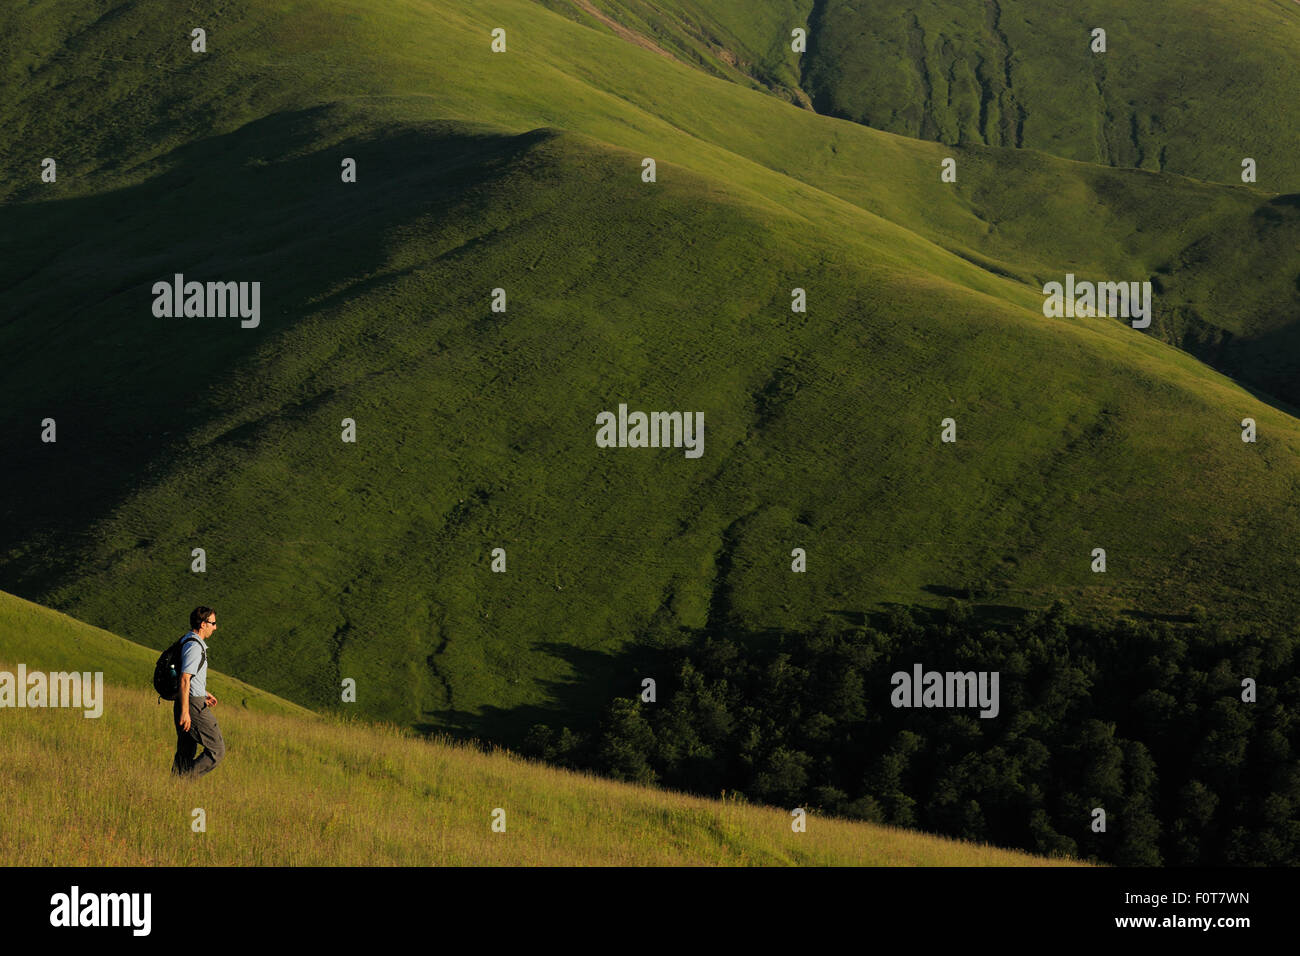 Ecotourist Niel Birnie walking in alpine grasslands in the Tarku mountains Natura 2000 site, Southern Carpathians, - Stock Image